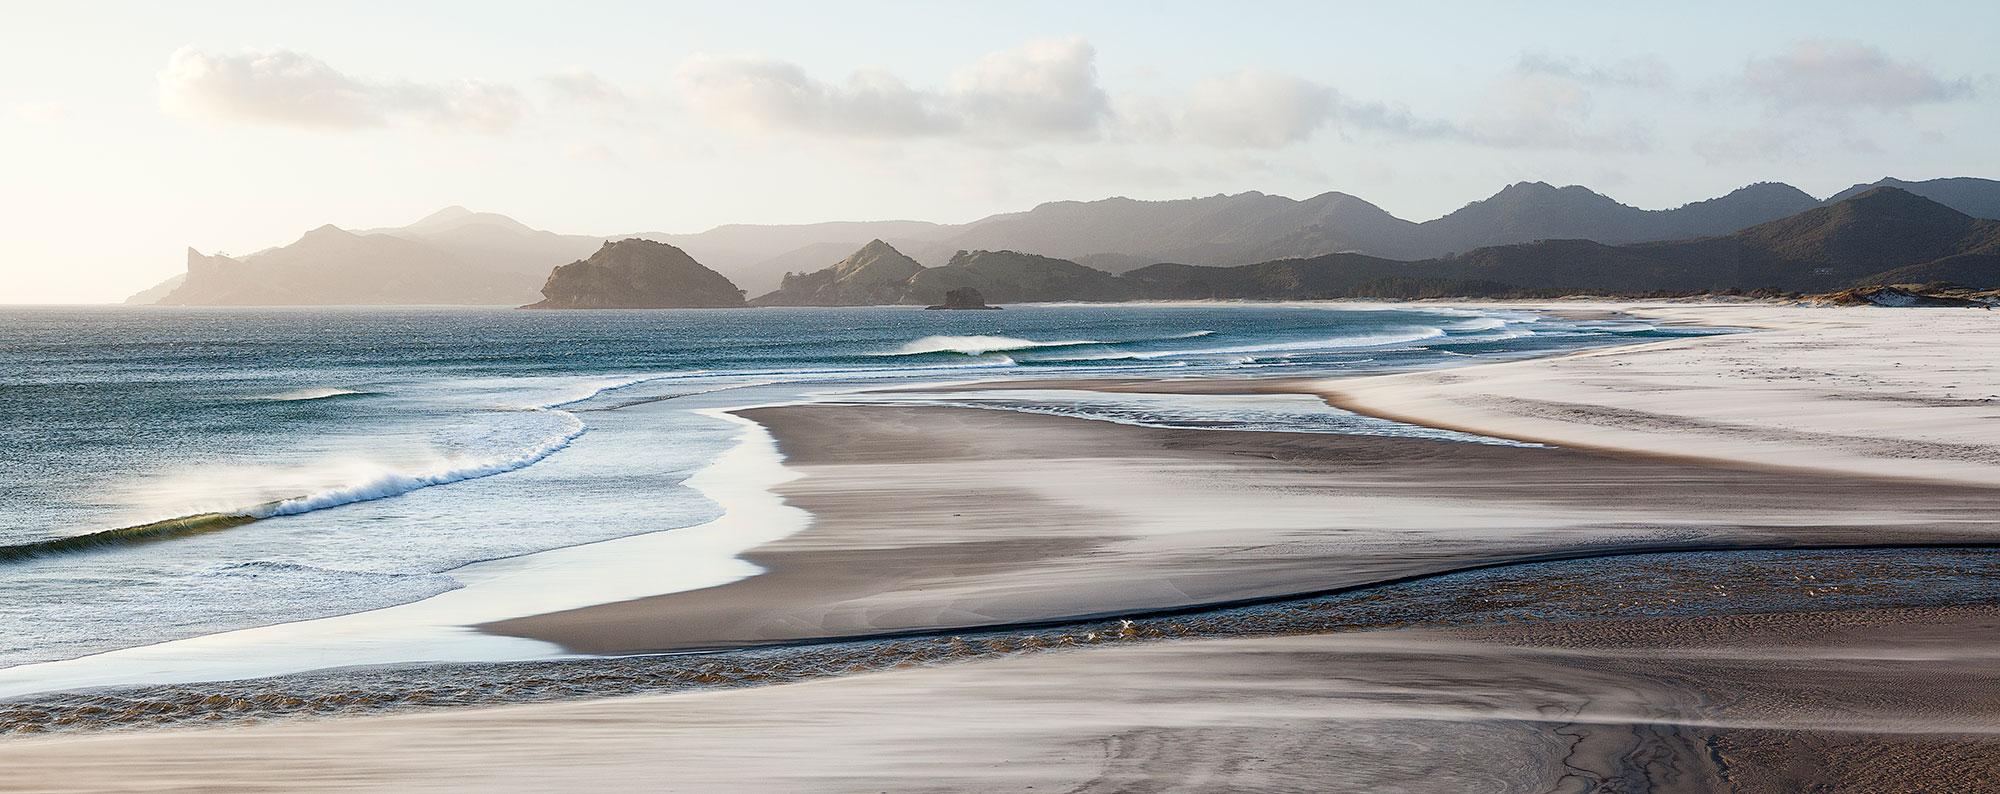 Aotea by Chris Morton